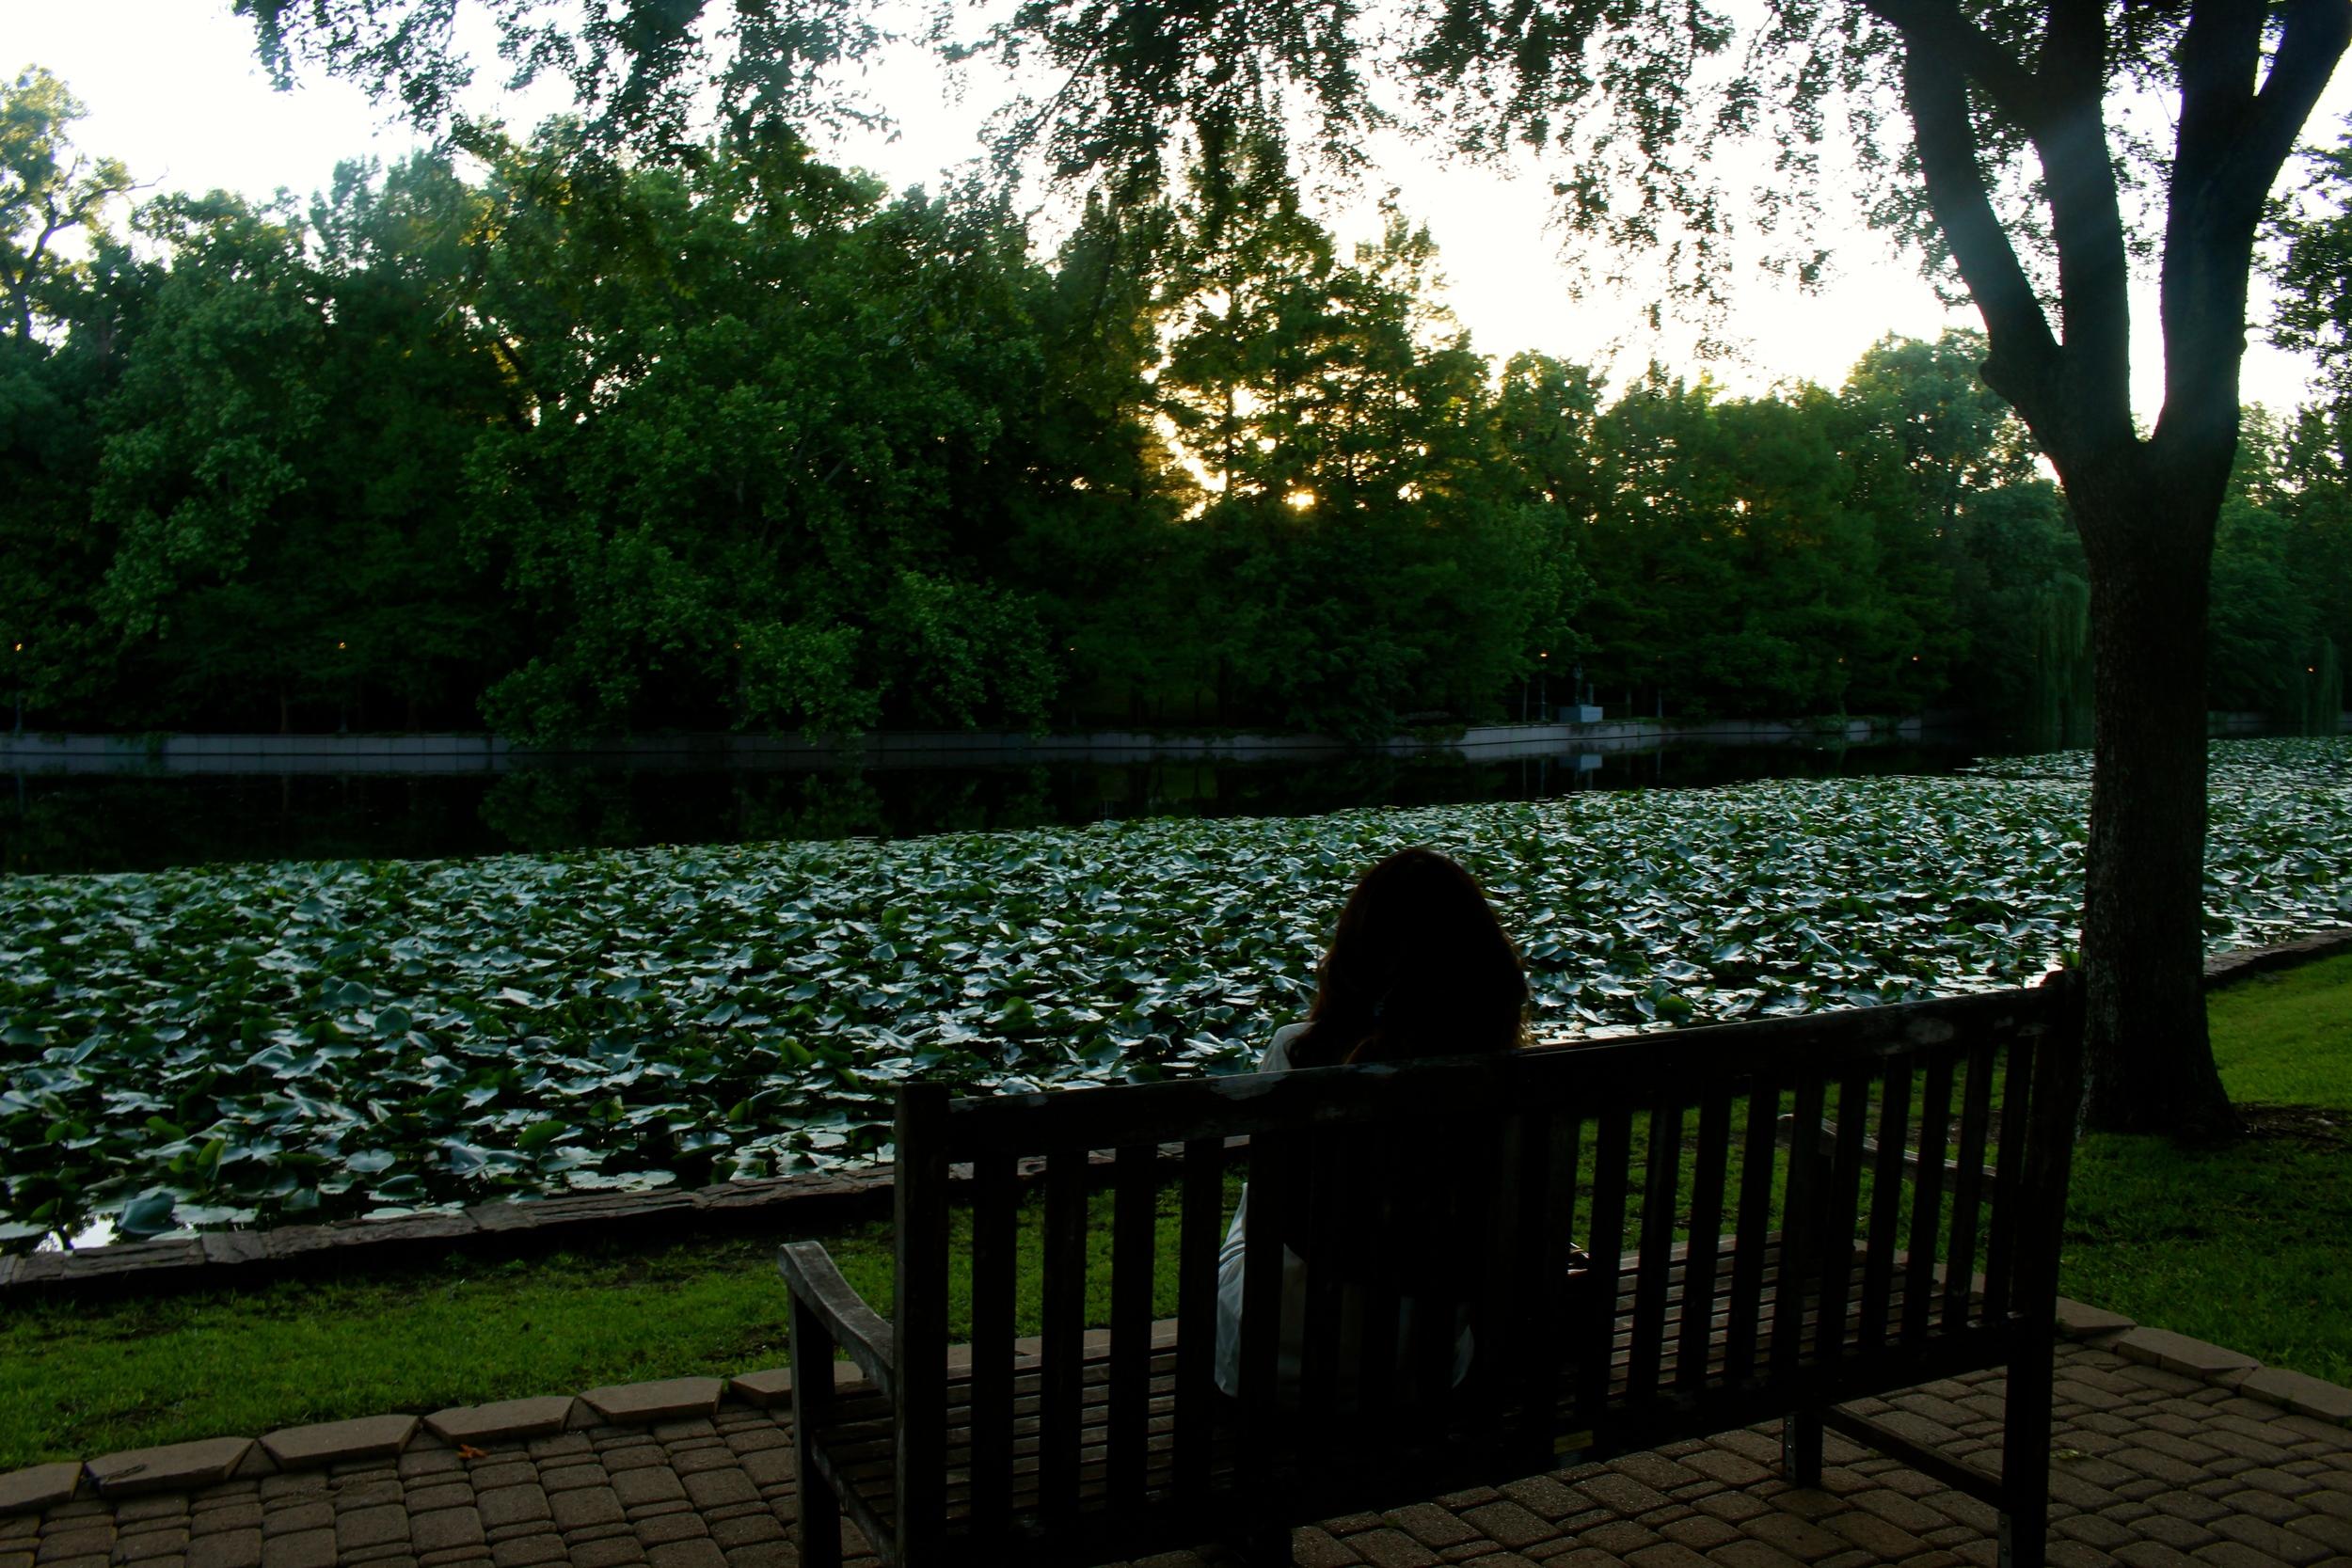 Dallas Travel Guide by Miami Lifestyle Blogger Zeinab Kristen